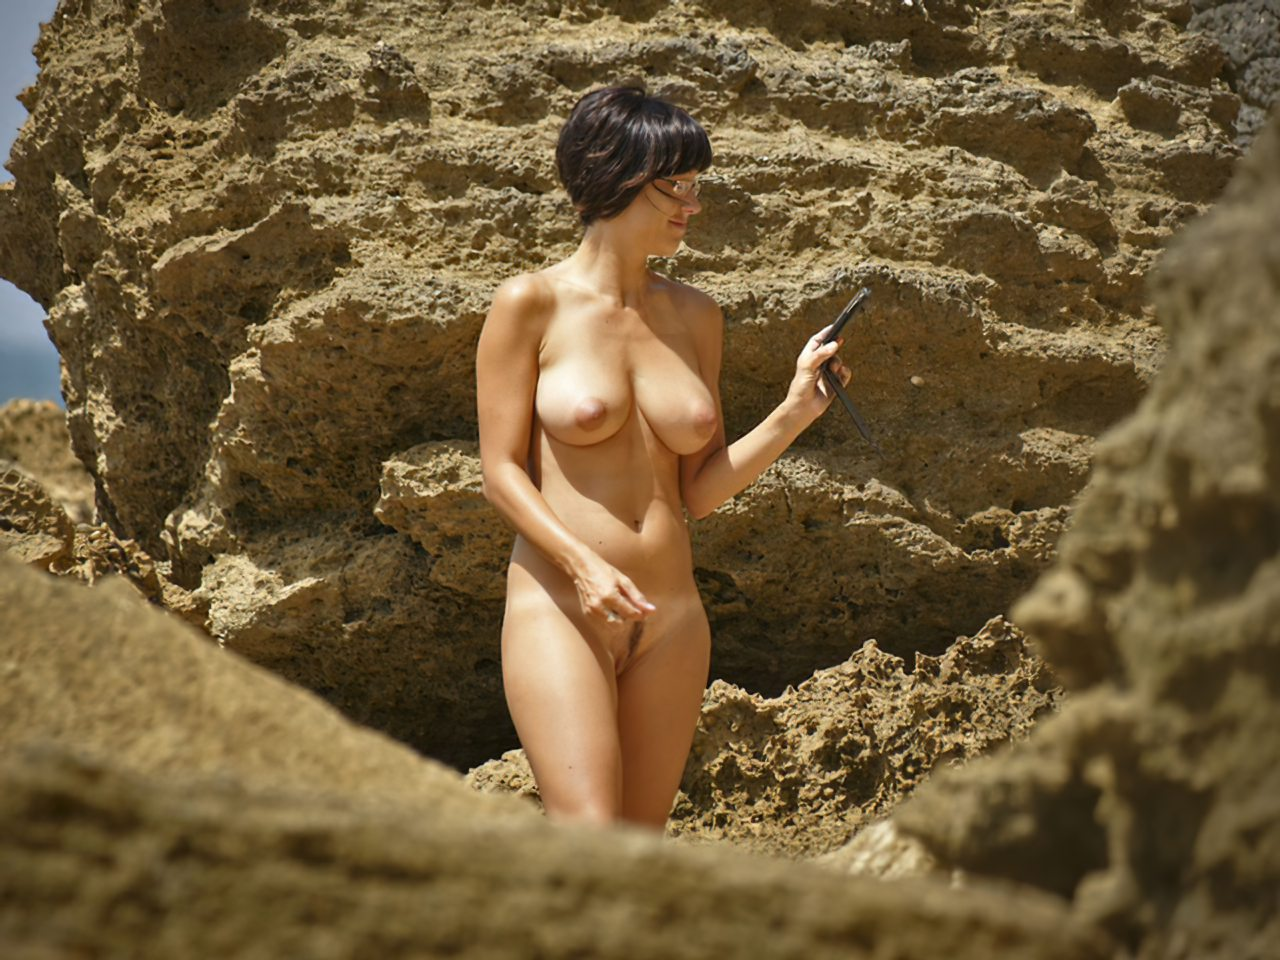 Mulher Pelada Praia Nudista (3)